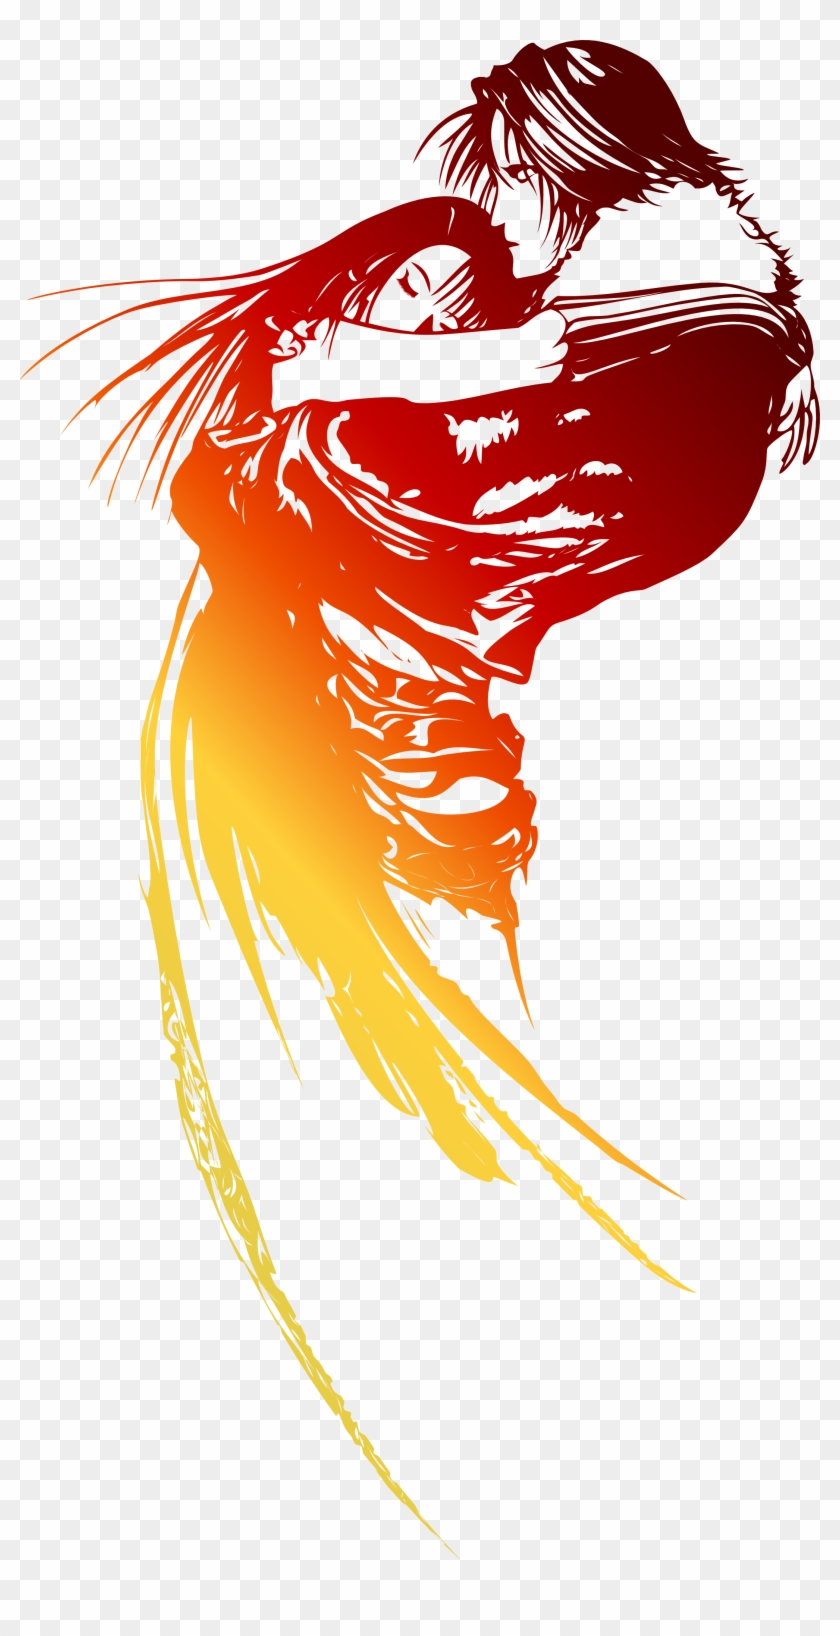 Final Fantasy Viii Logo, HD Png Download (#1503865).